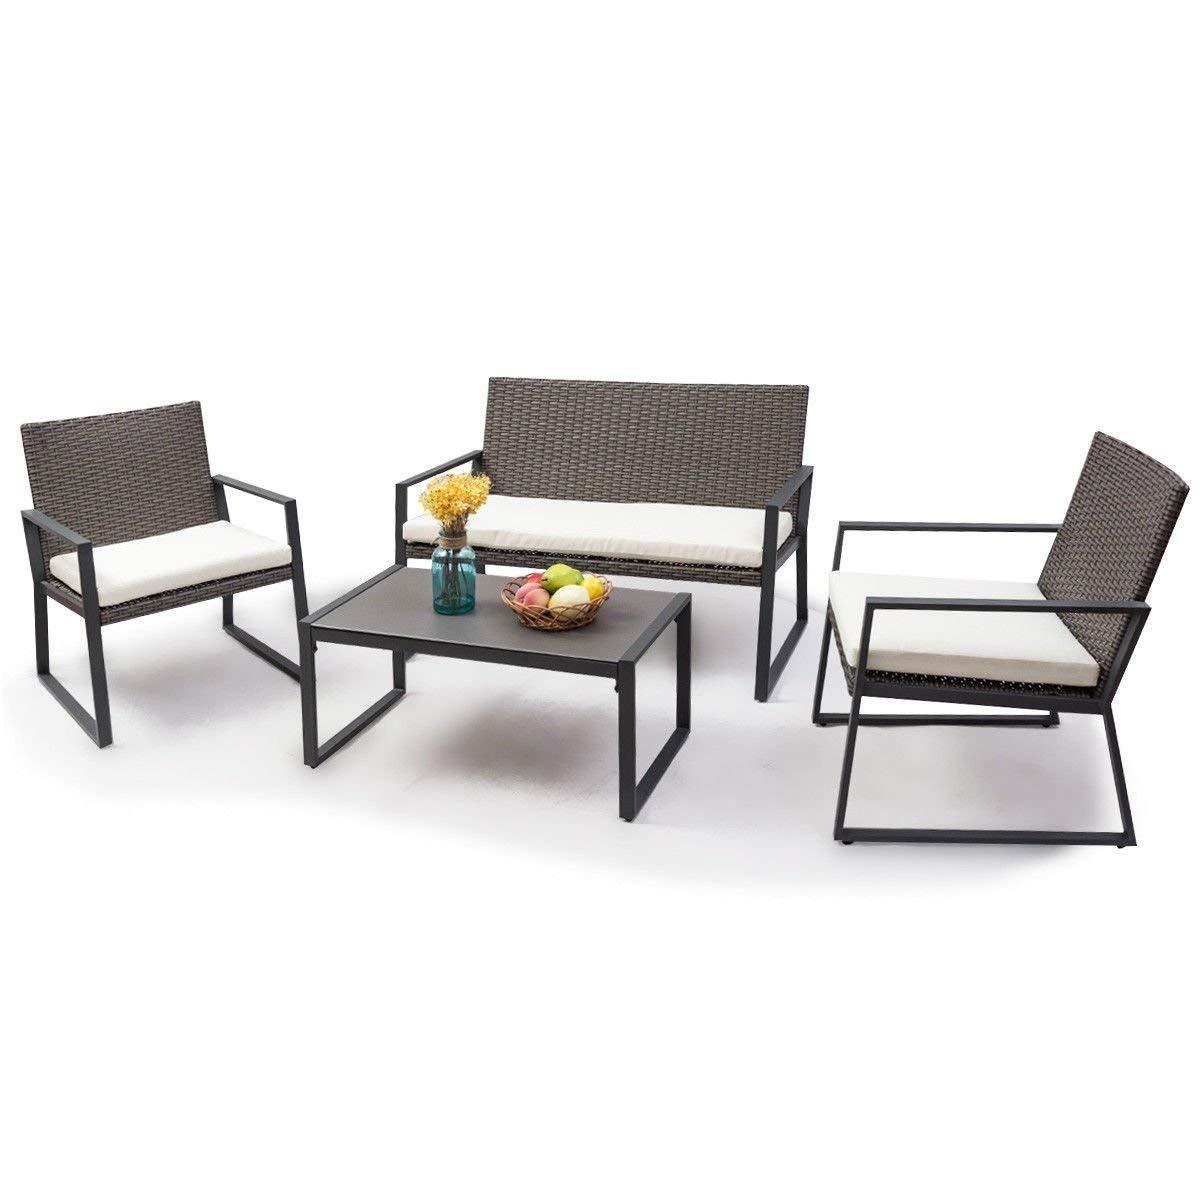 Amazon.com: Asiento acolchado tangkula 4 Pcs Muebles de ...